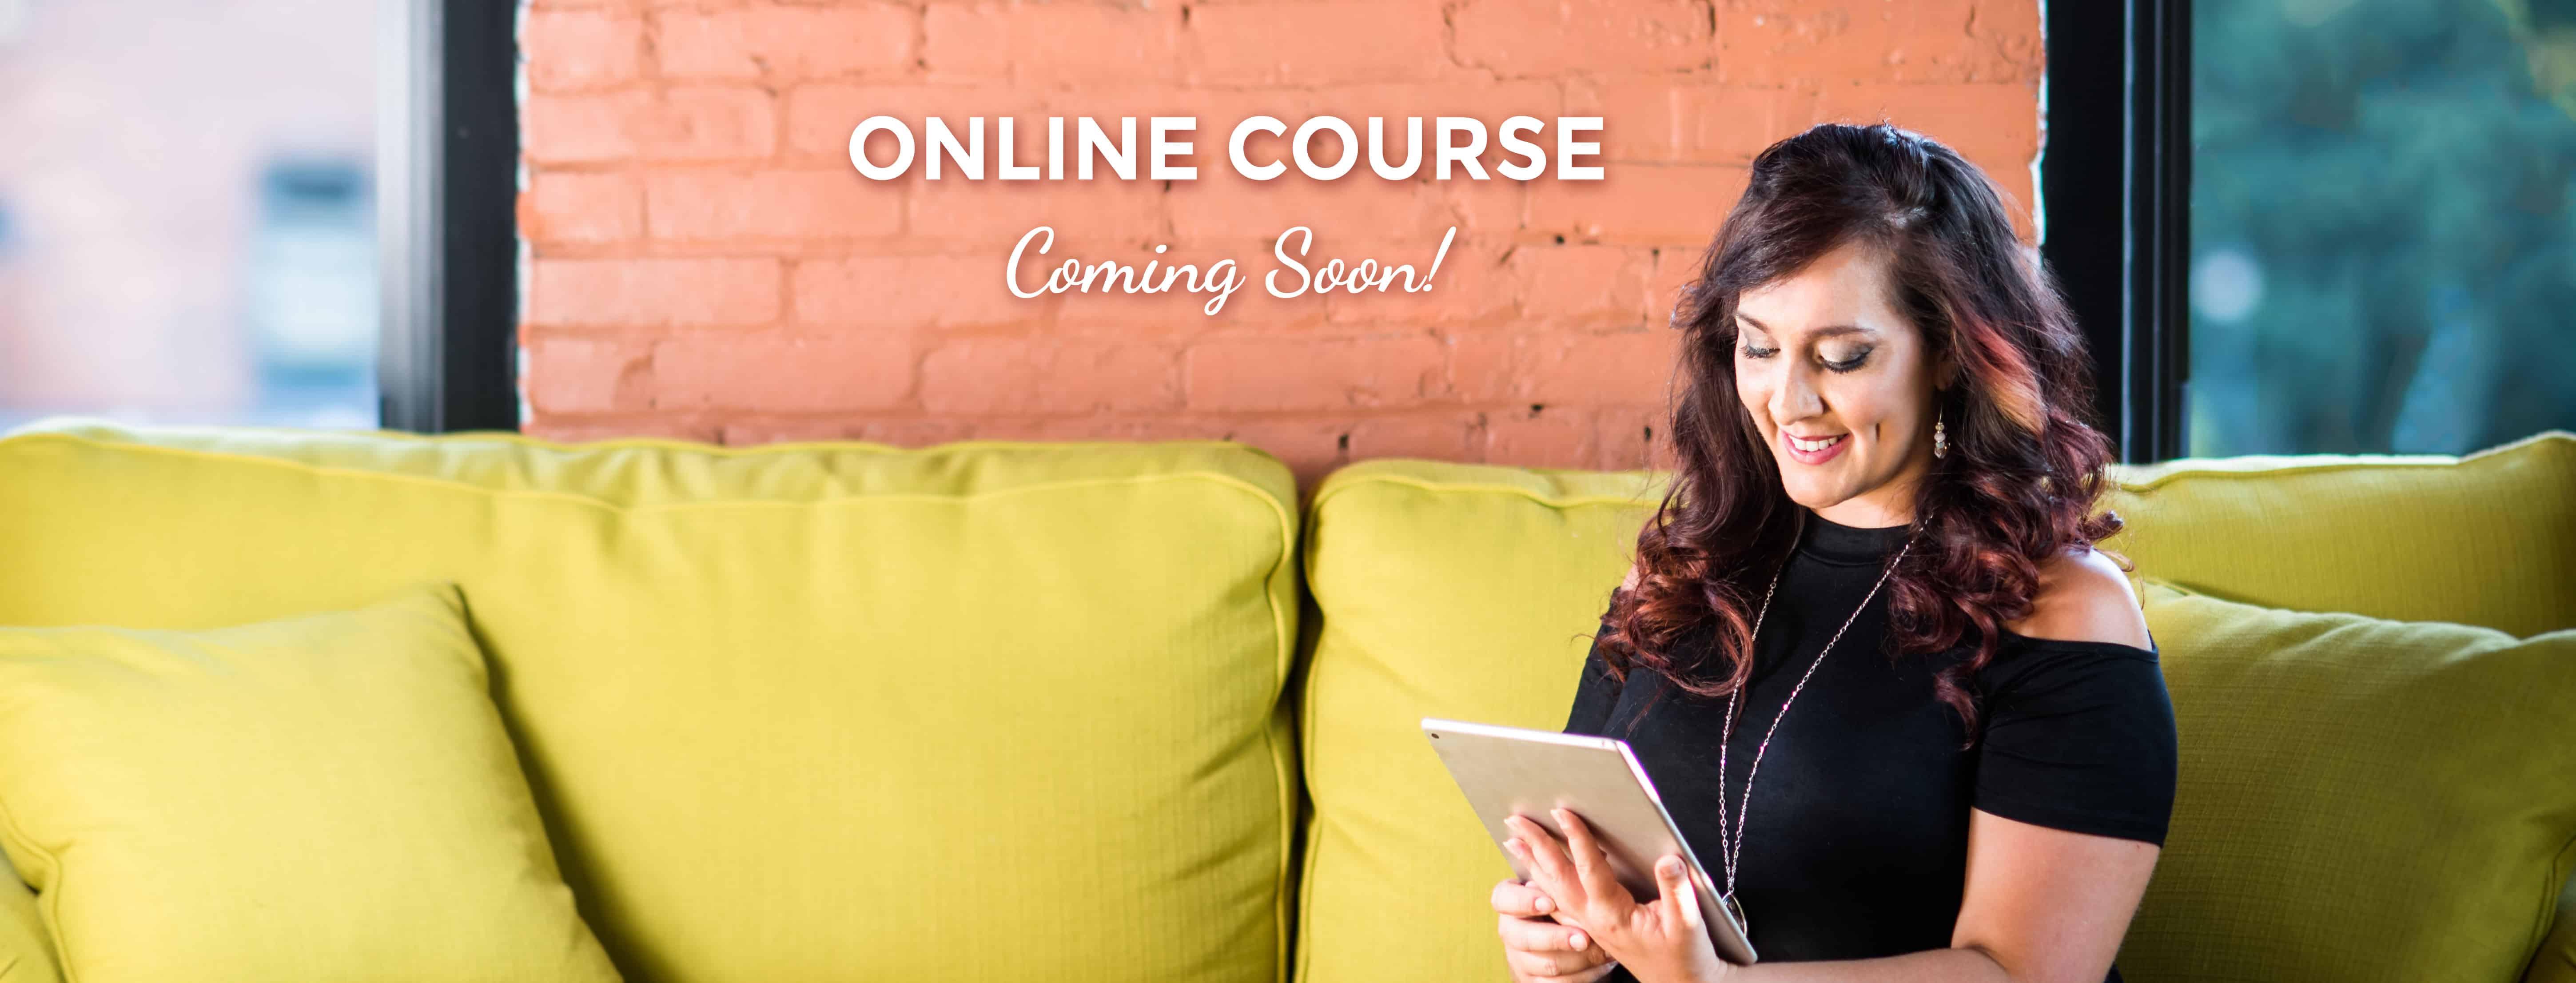 Reagan Burns online course